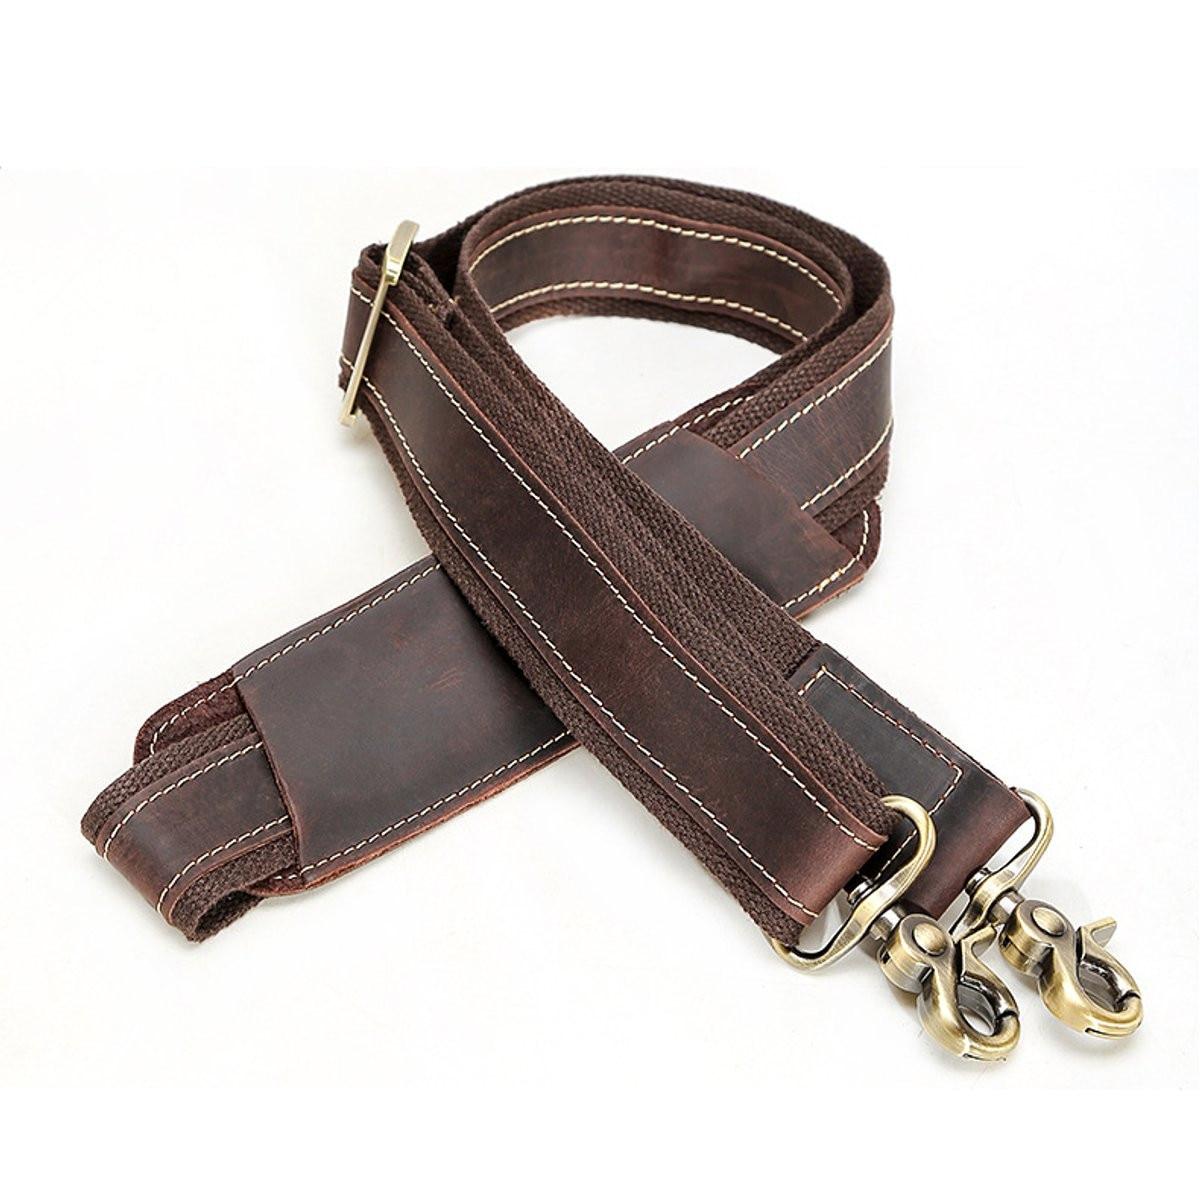 Adjustable Men Leather Cowhide Shoulder Strap Buckle Belt Messenger Bag Replacement Belt Bag Parts Accessories Detachable